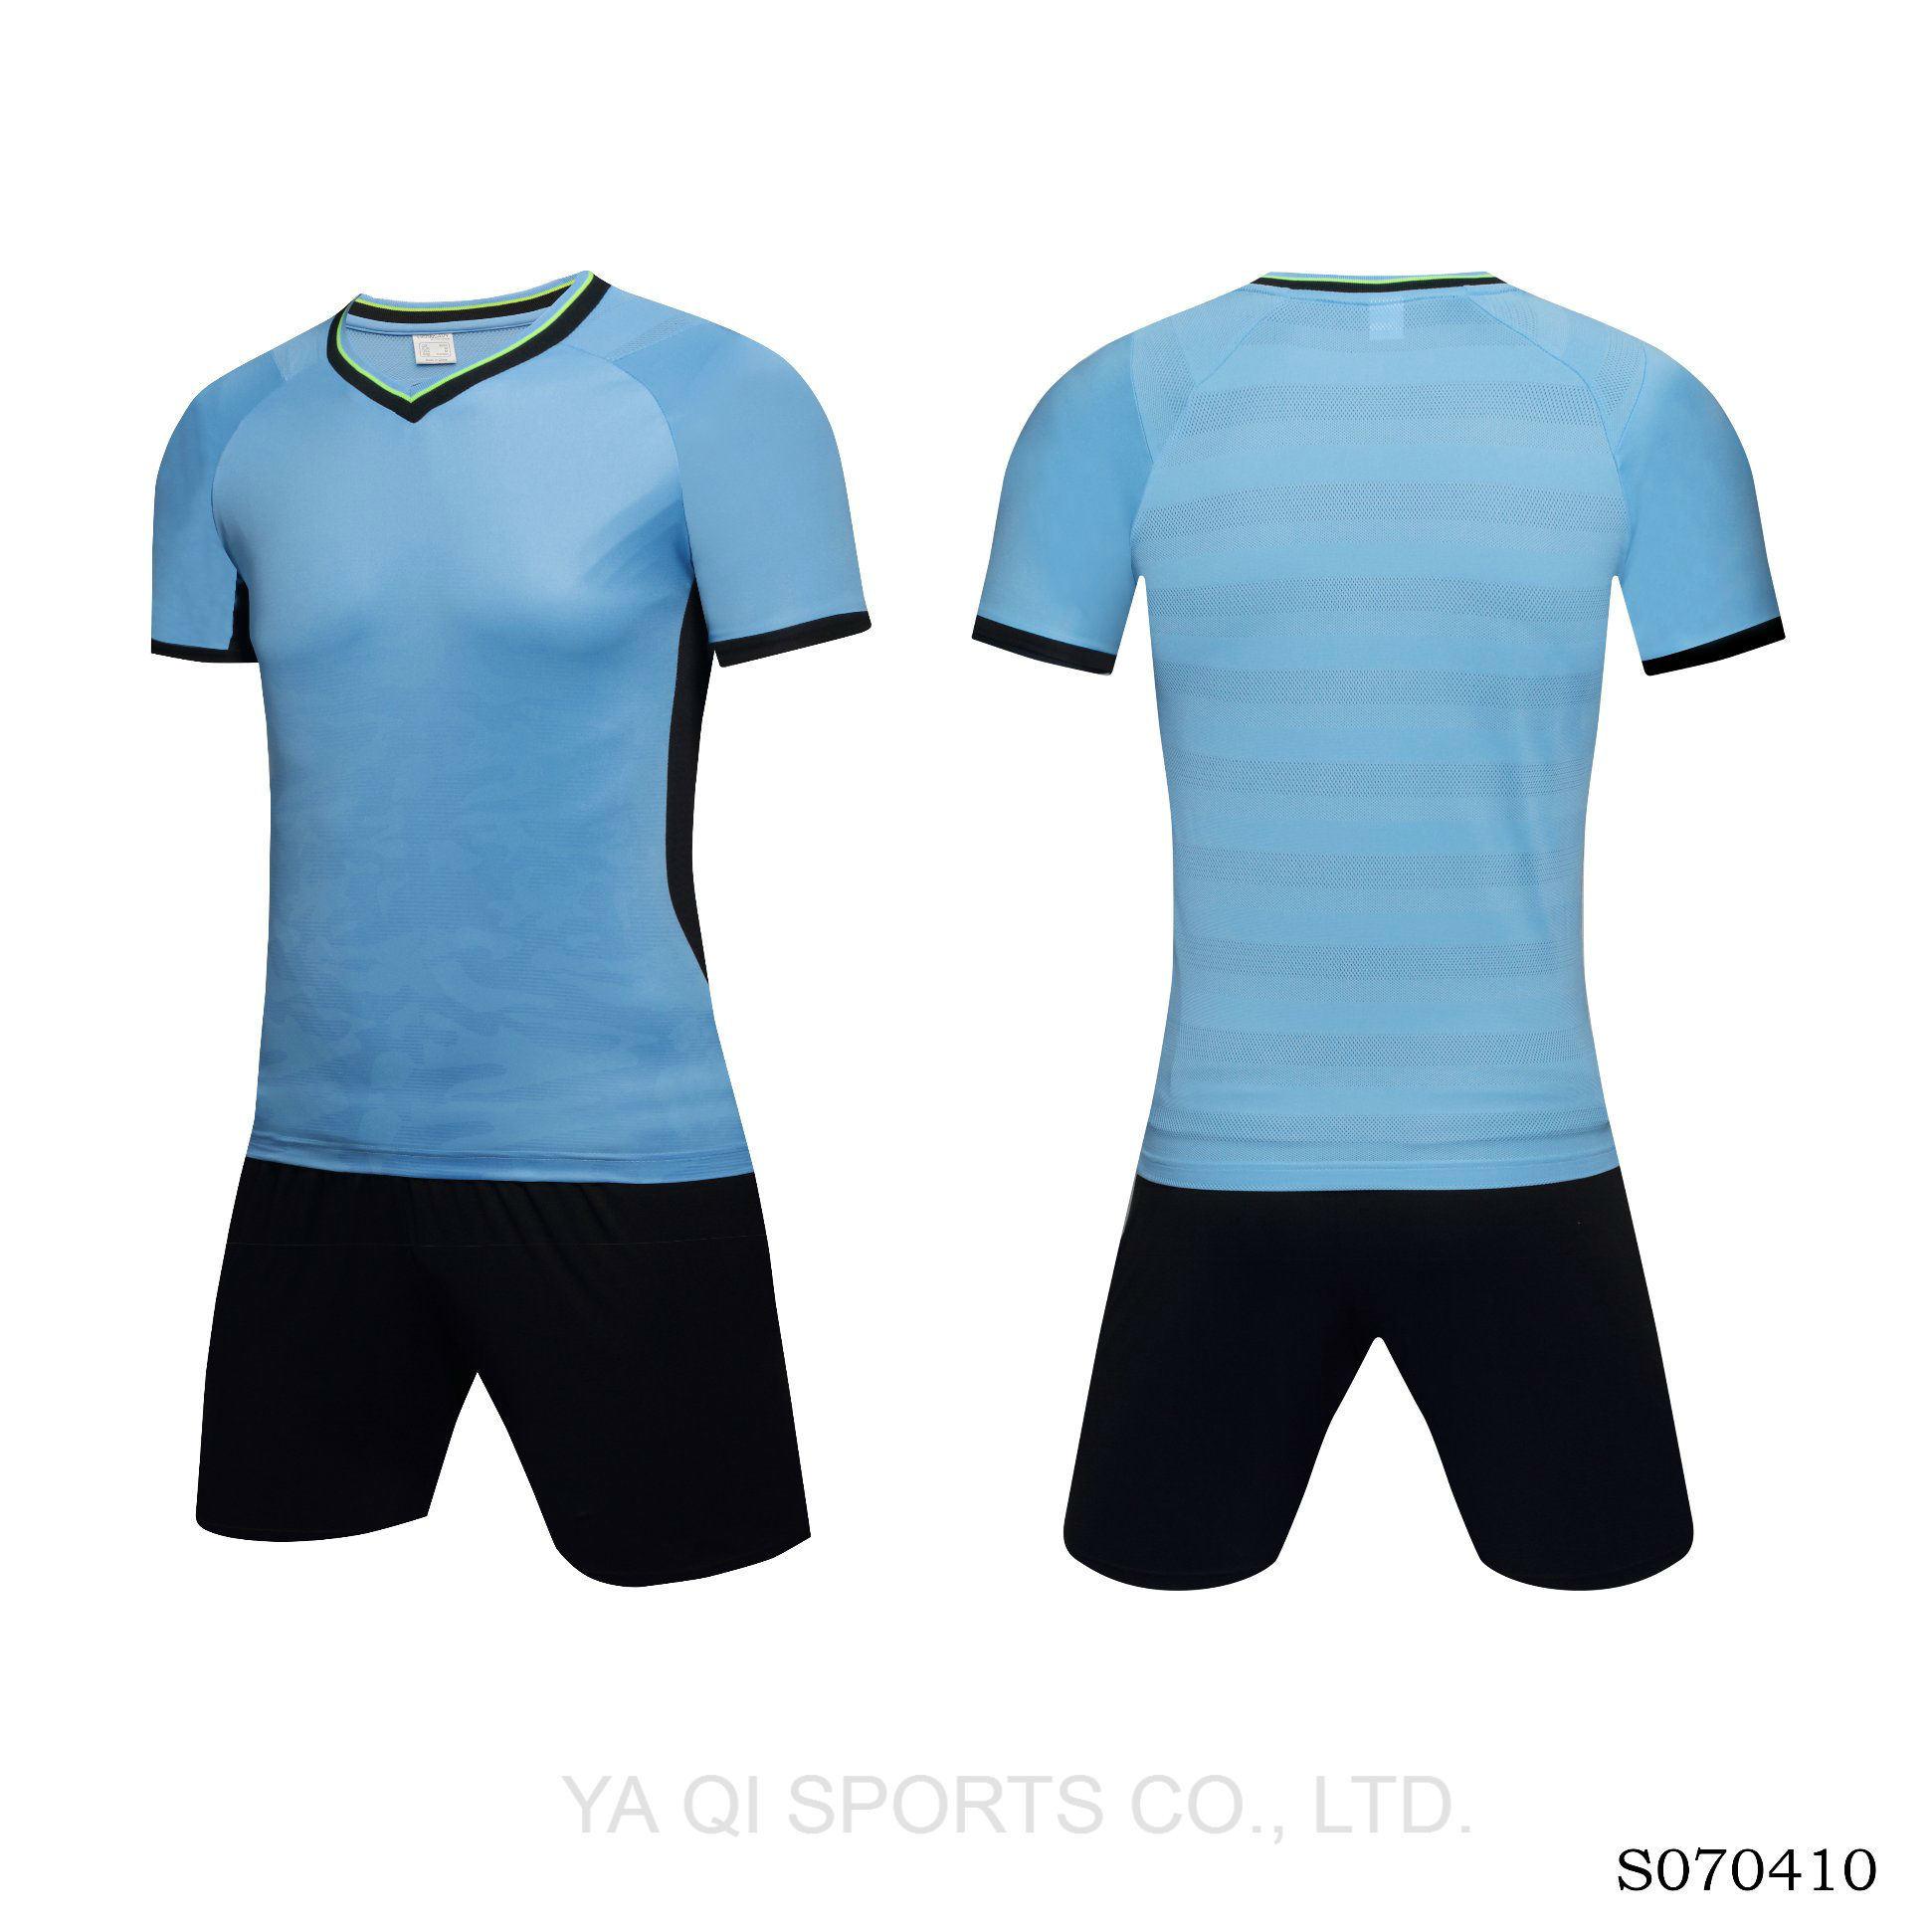 Customized OEM Your Logo Football Uniform Blank Football Jersey Soccer